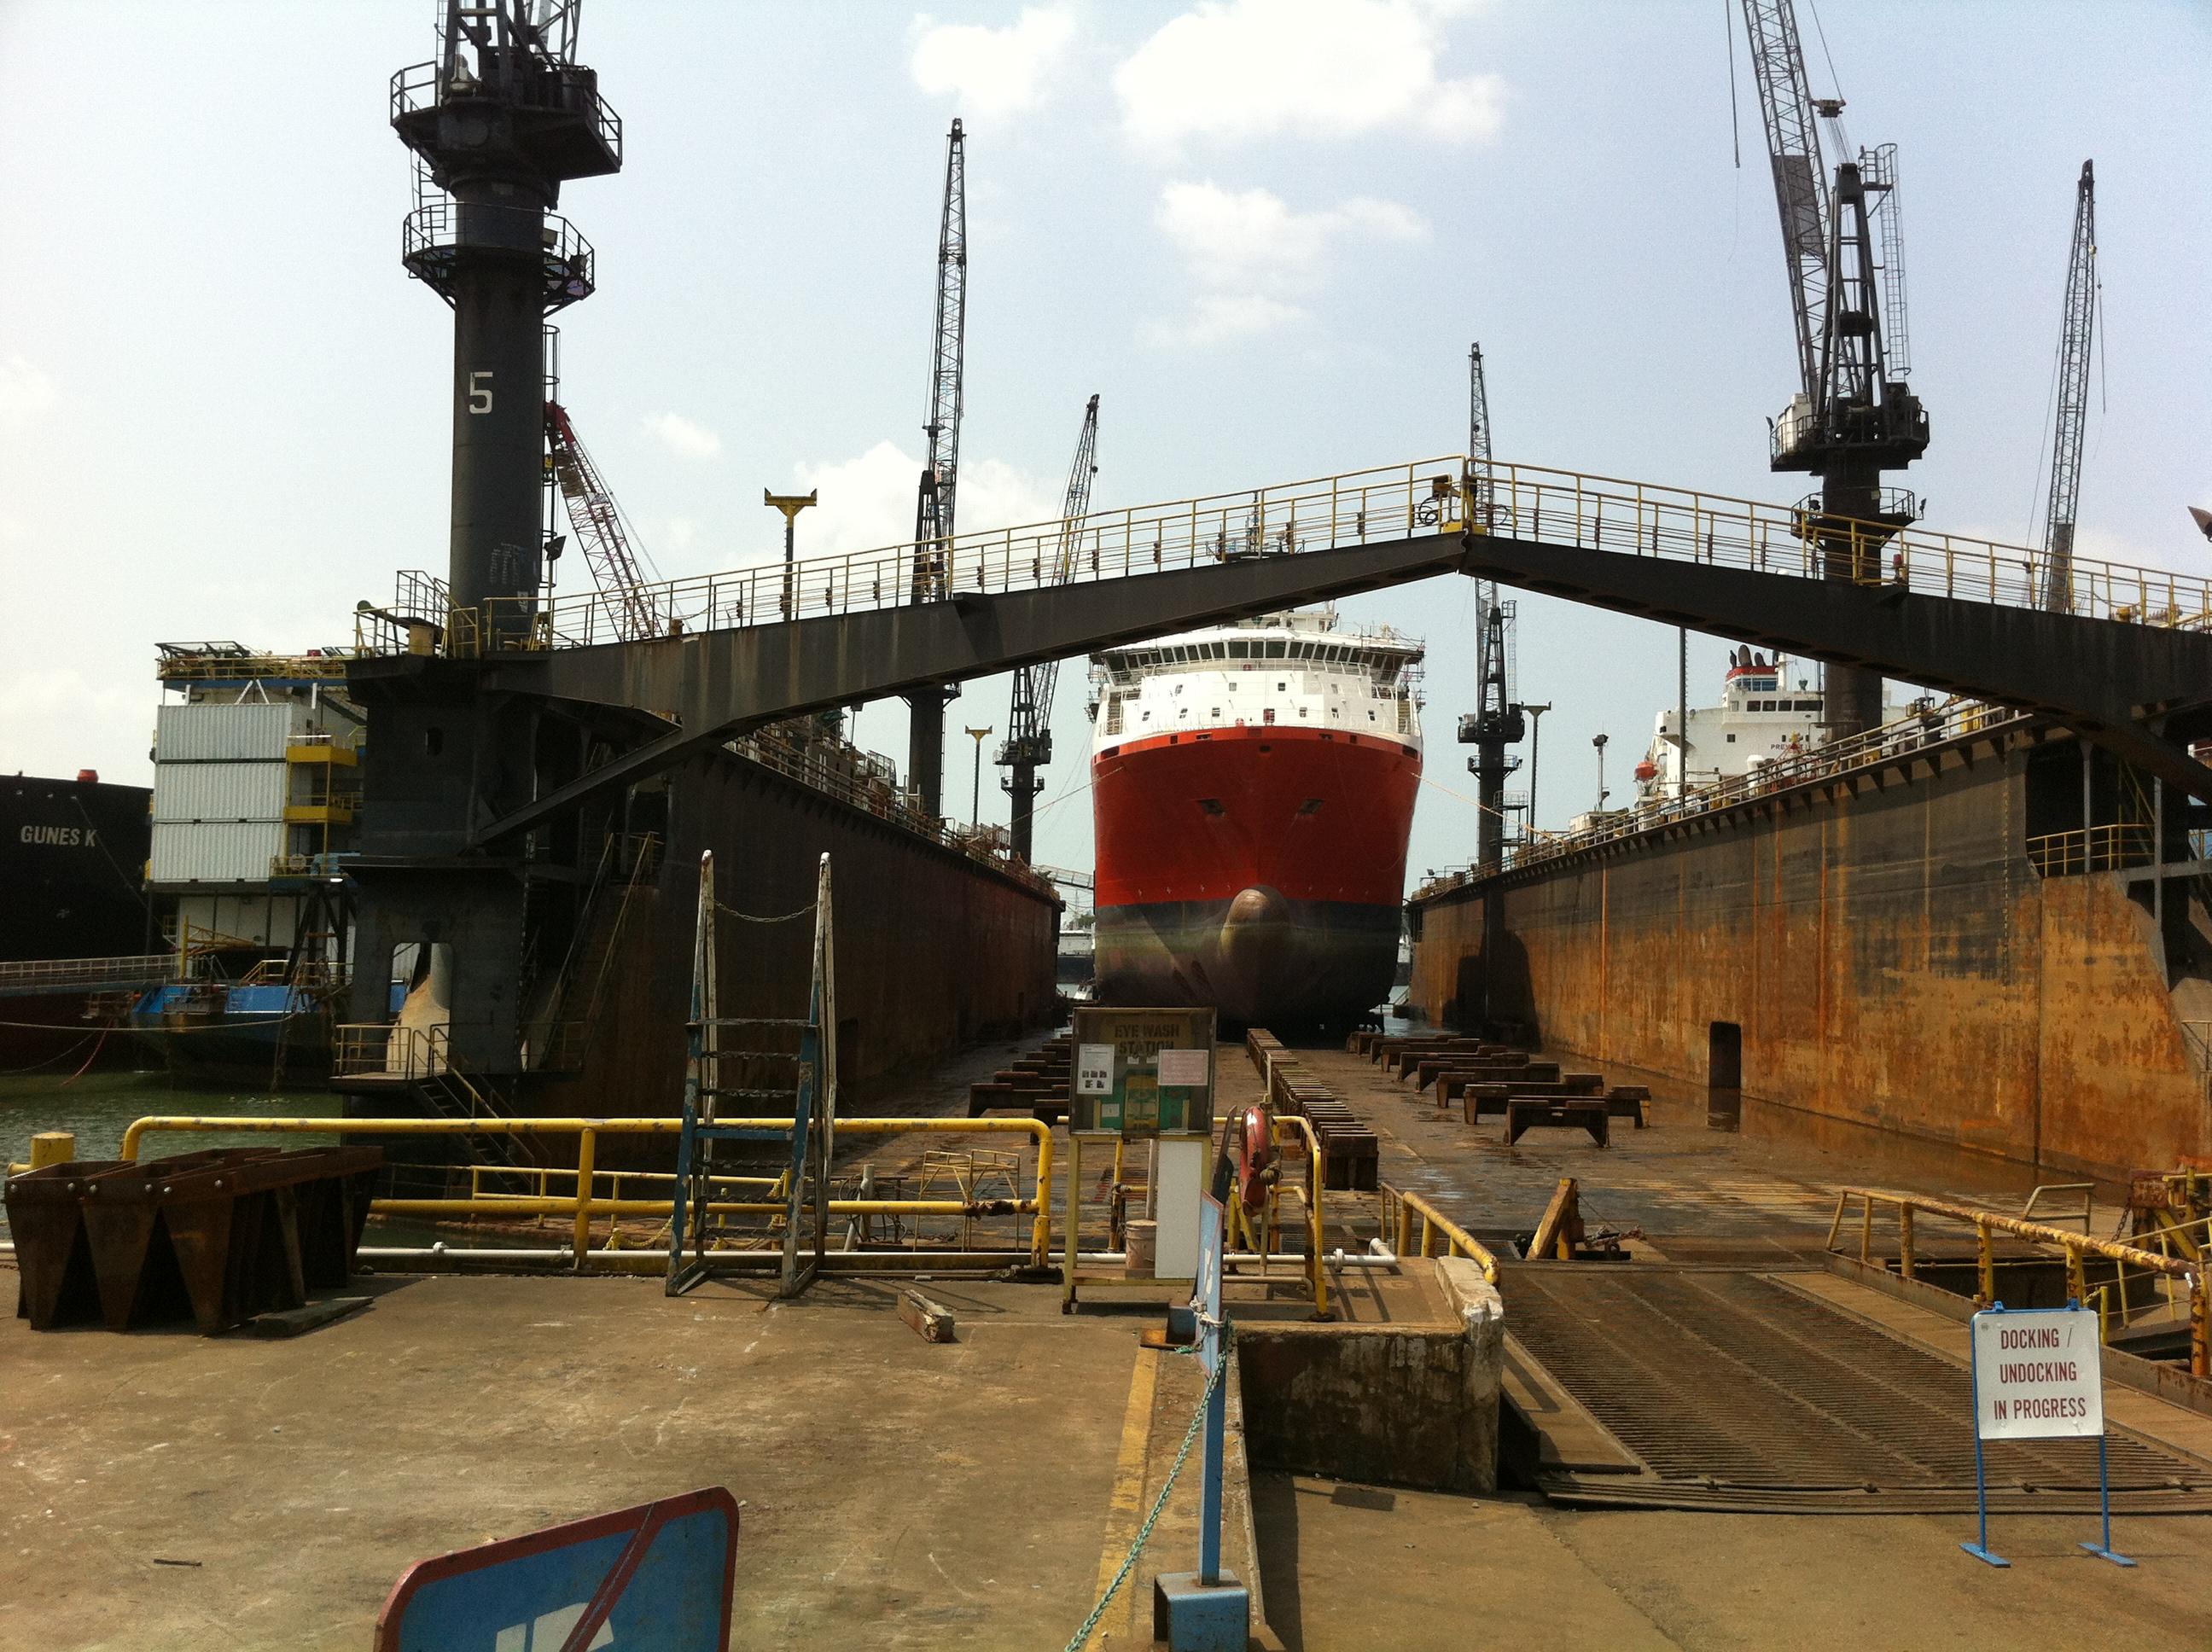 AMECS Docking Gallery